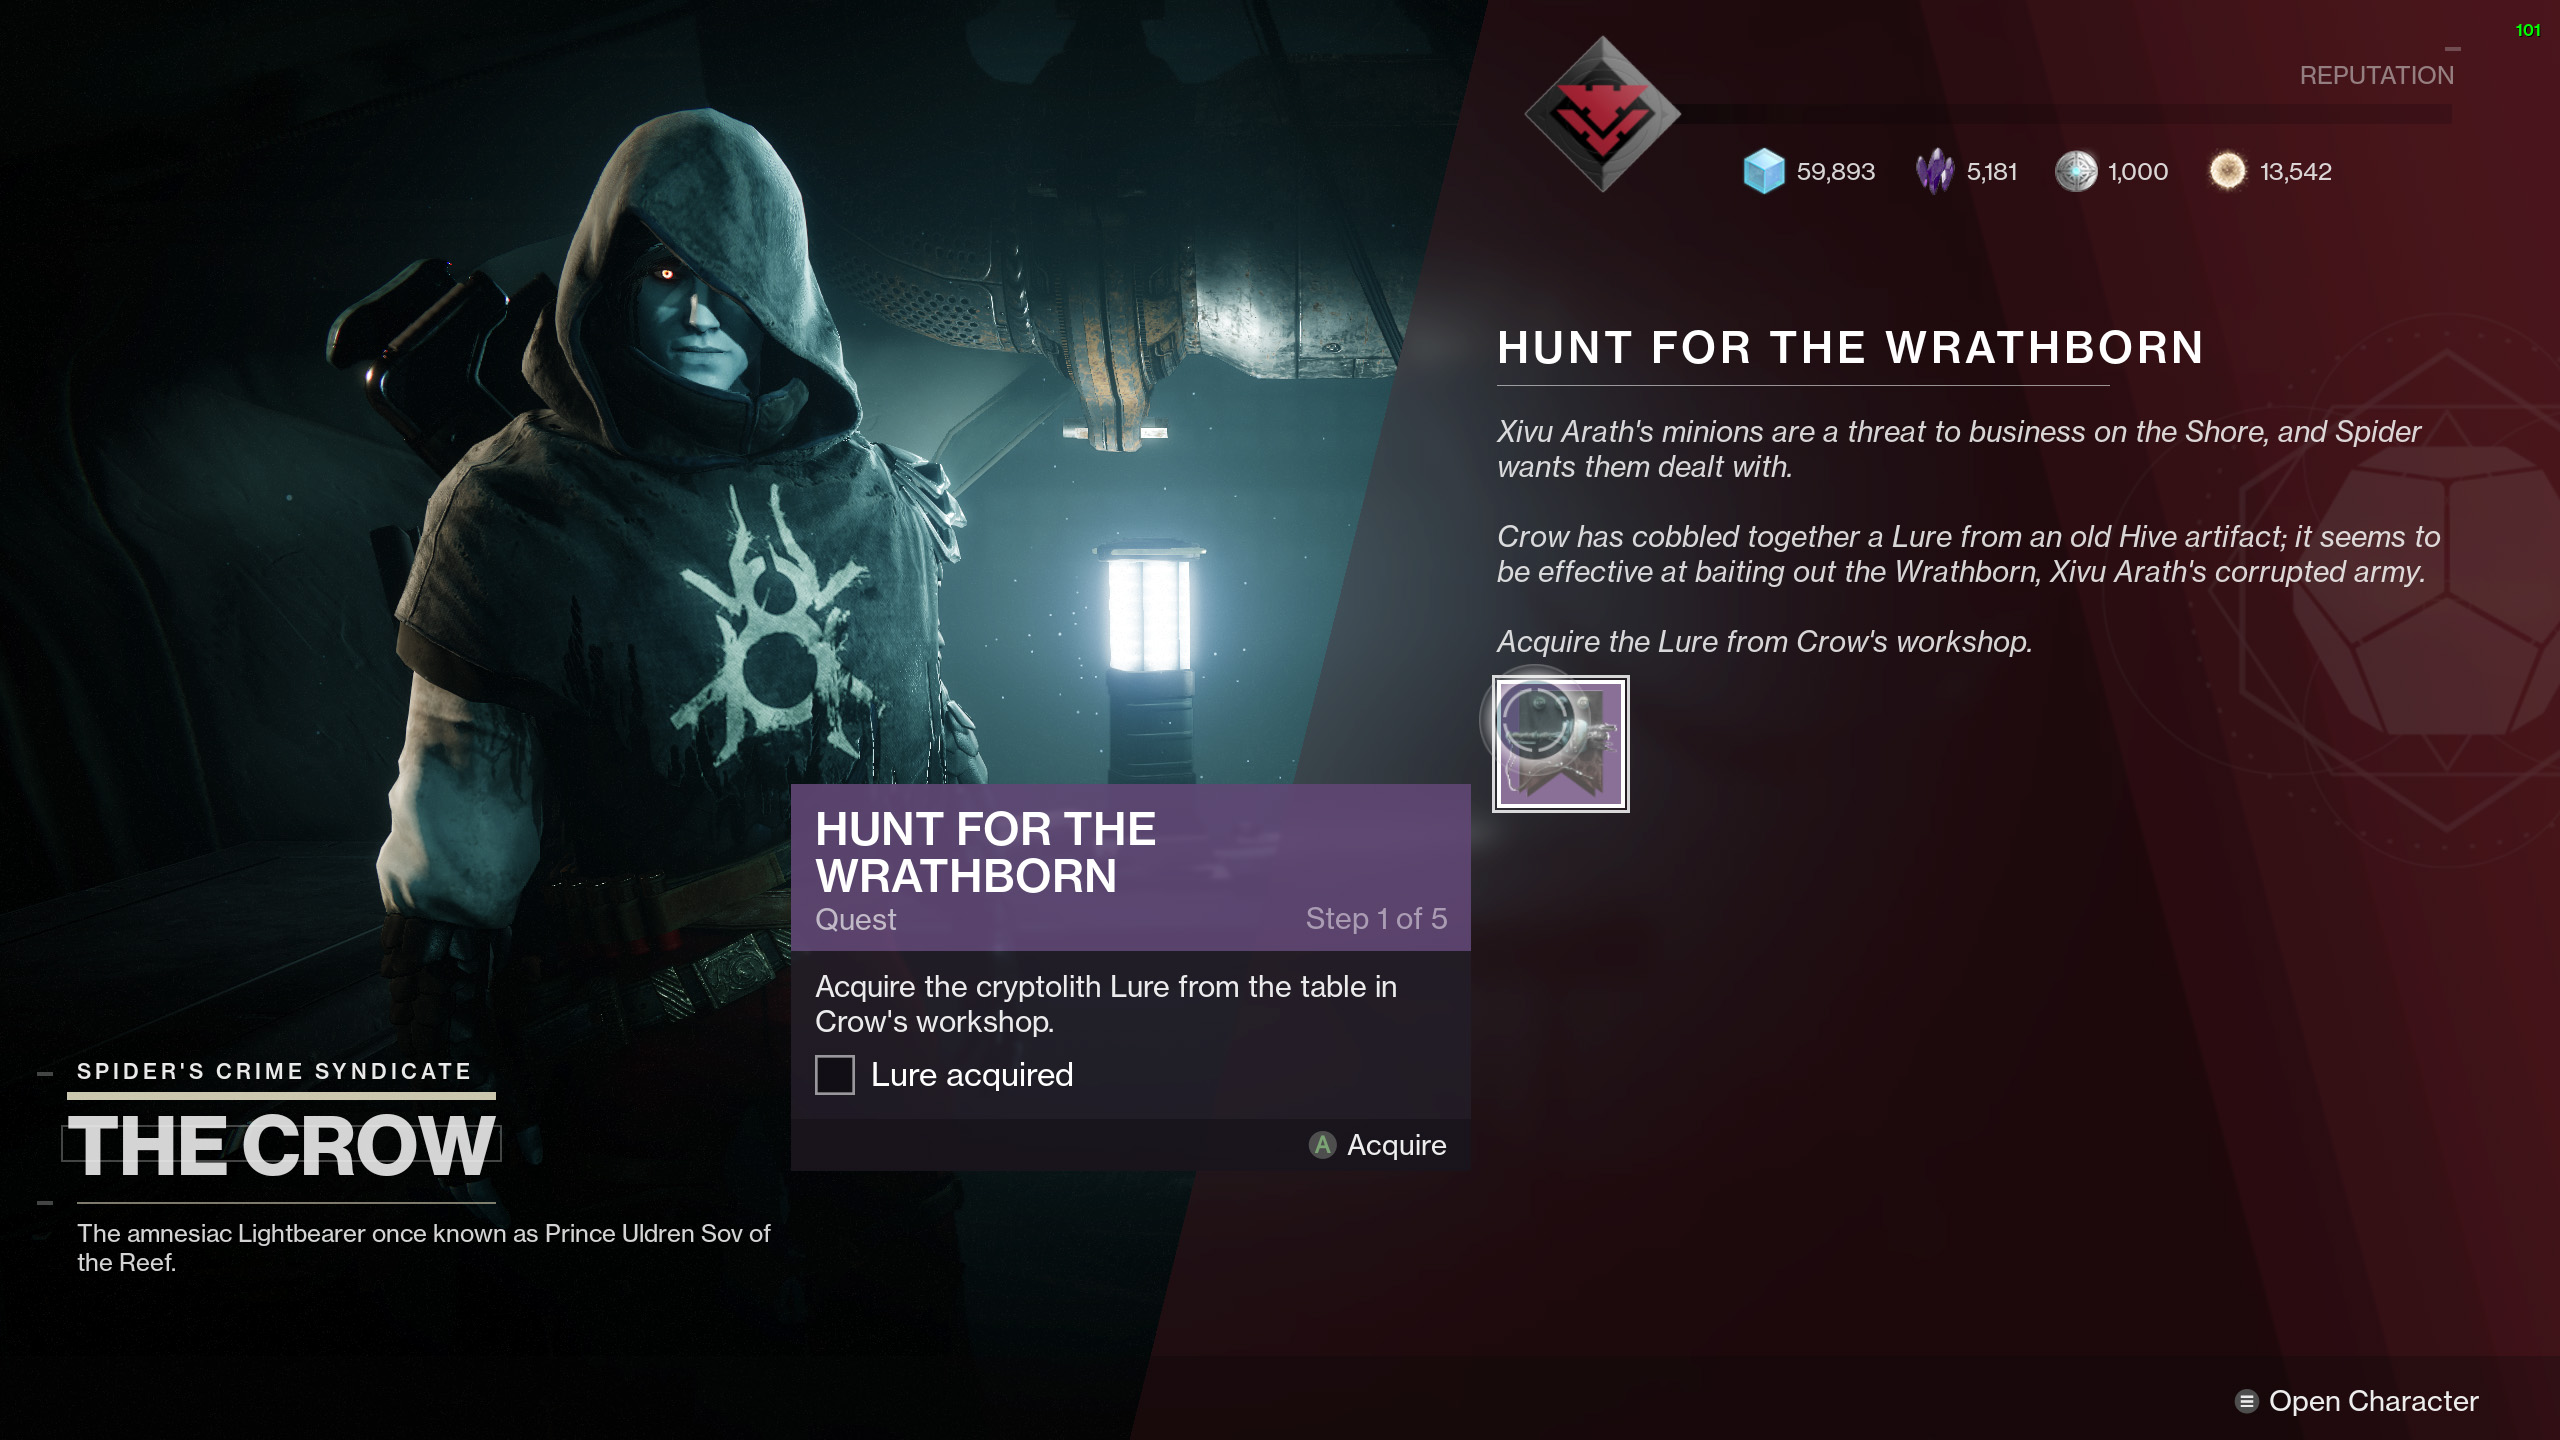 Destiny 2 Hunt for the Wrathborn